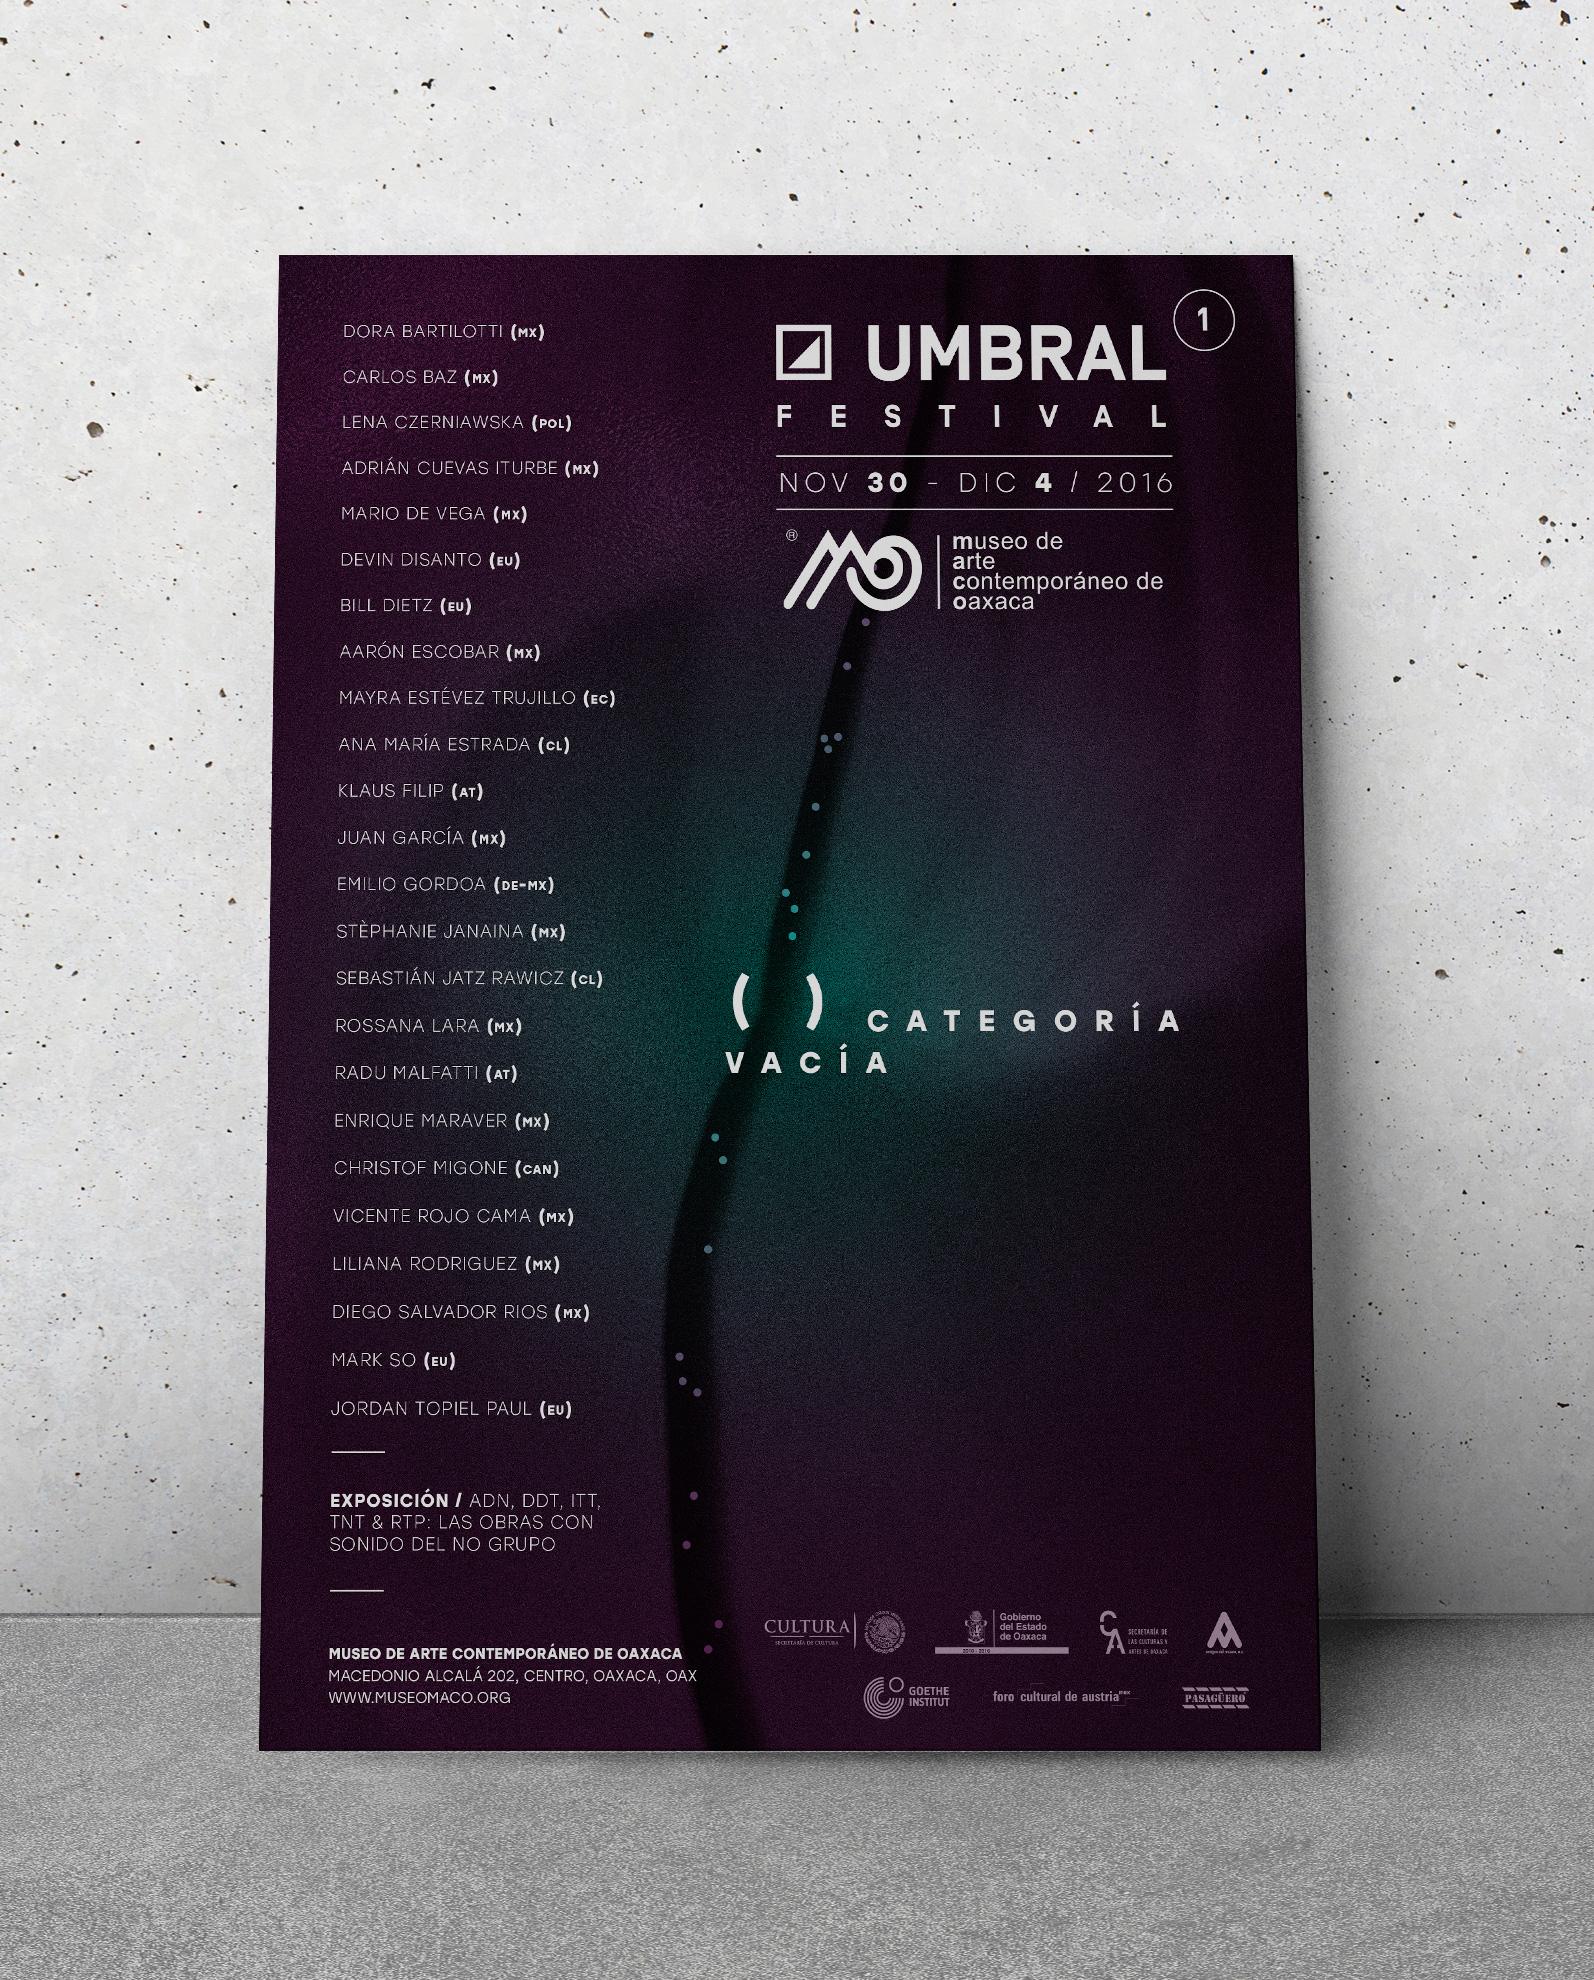 01_Umbral